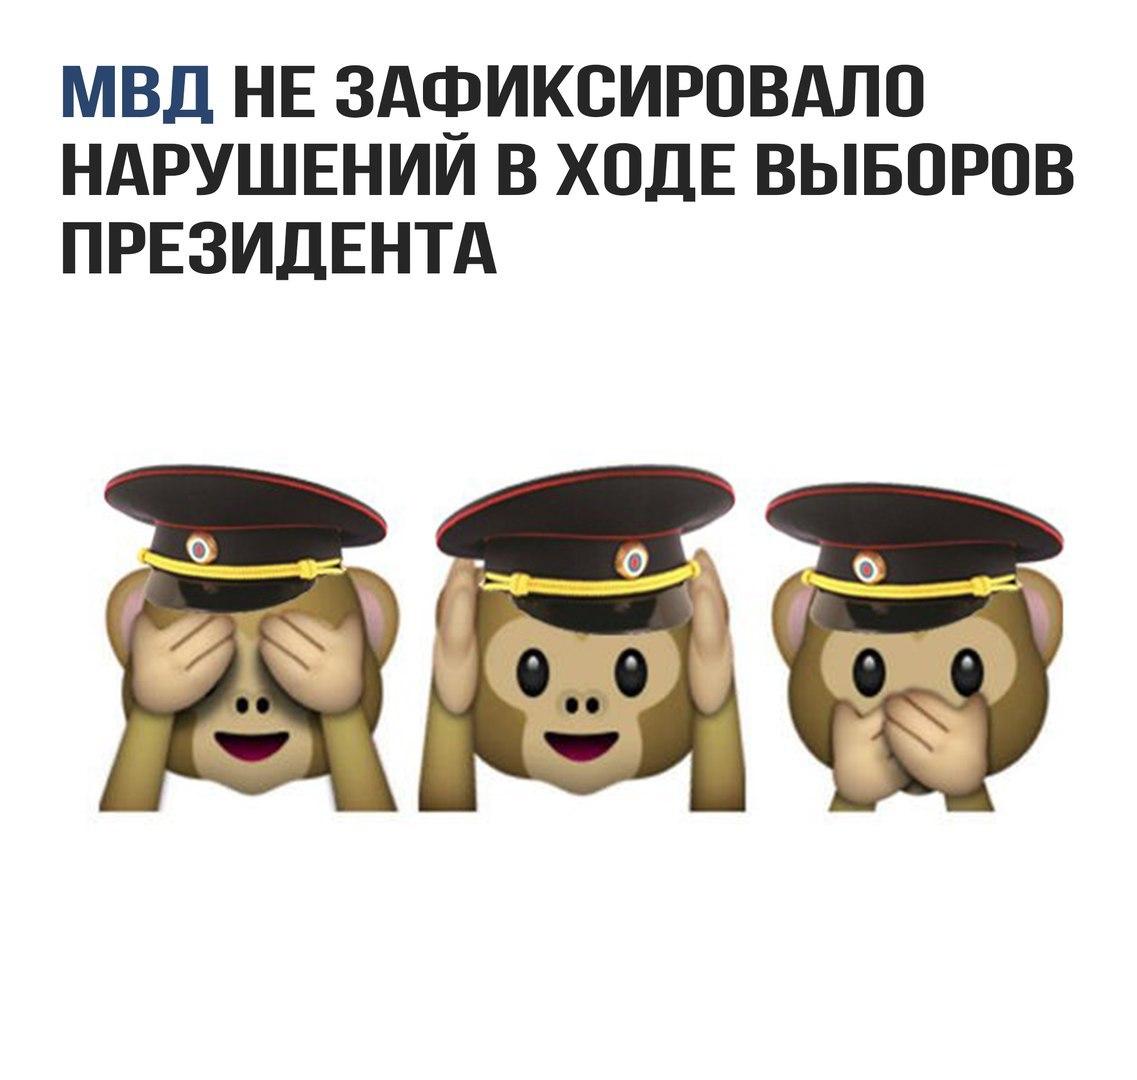 https://pp.userapi.com/c623900/v623900827/e35db/tlS3C_oBIco.jpg